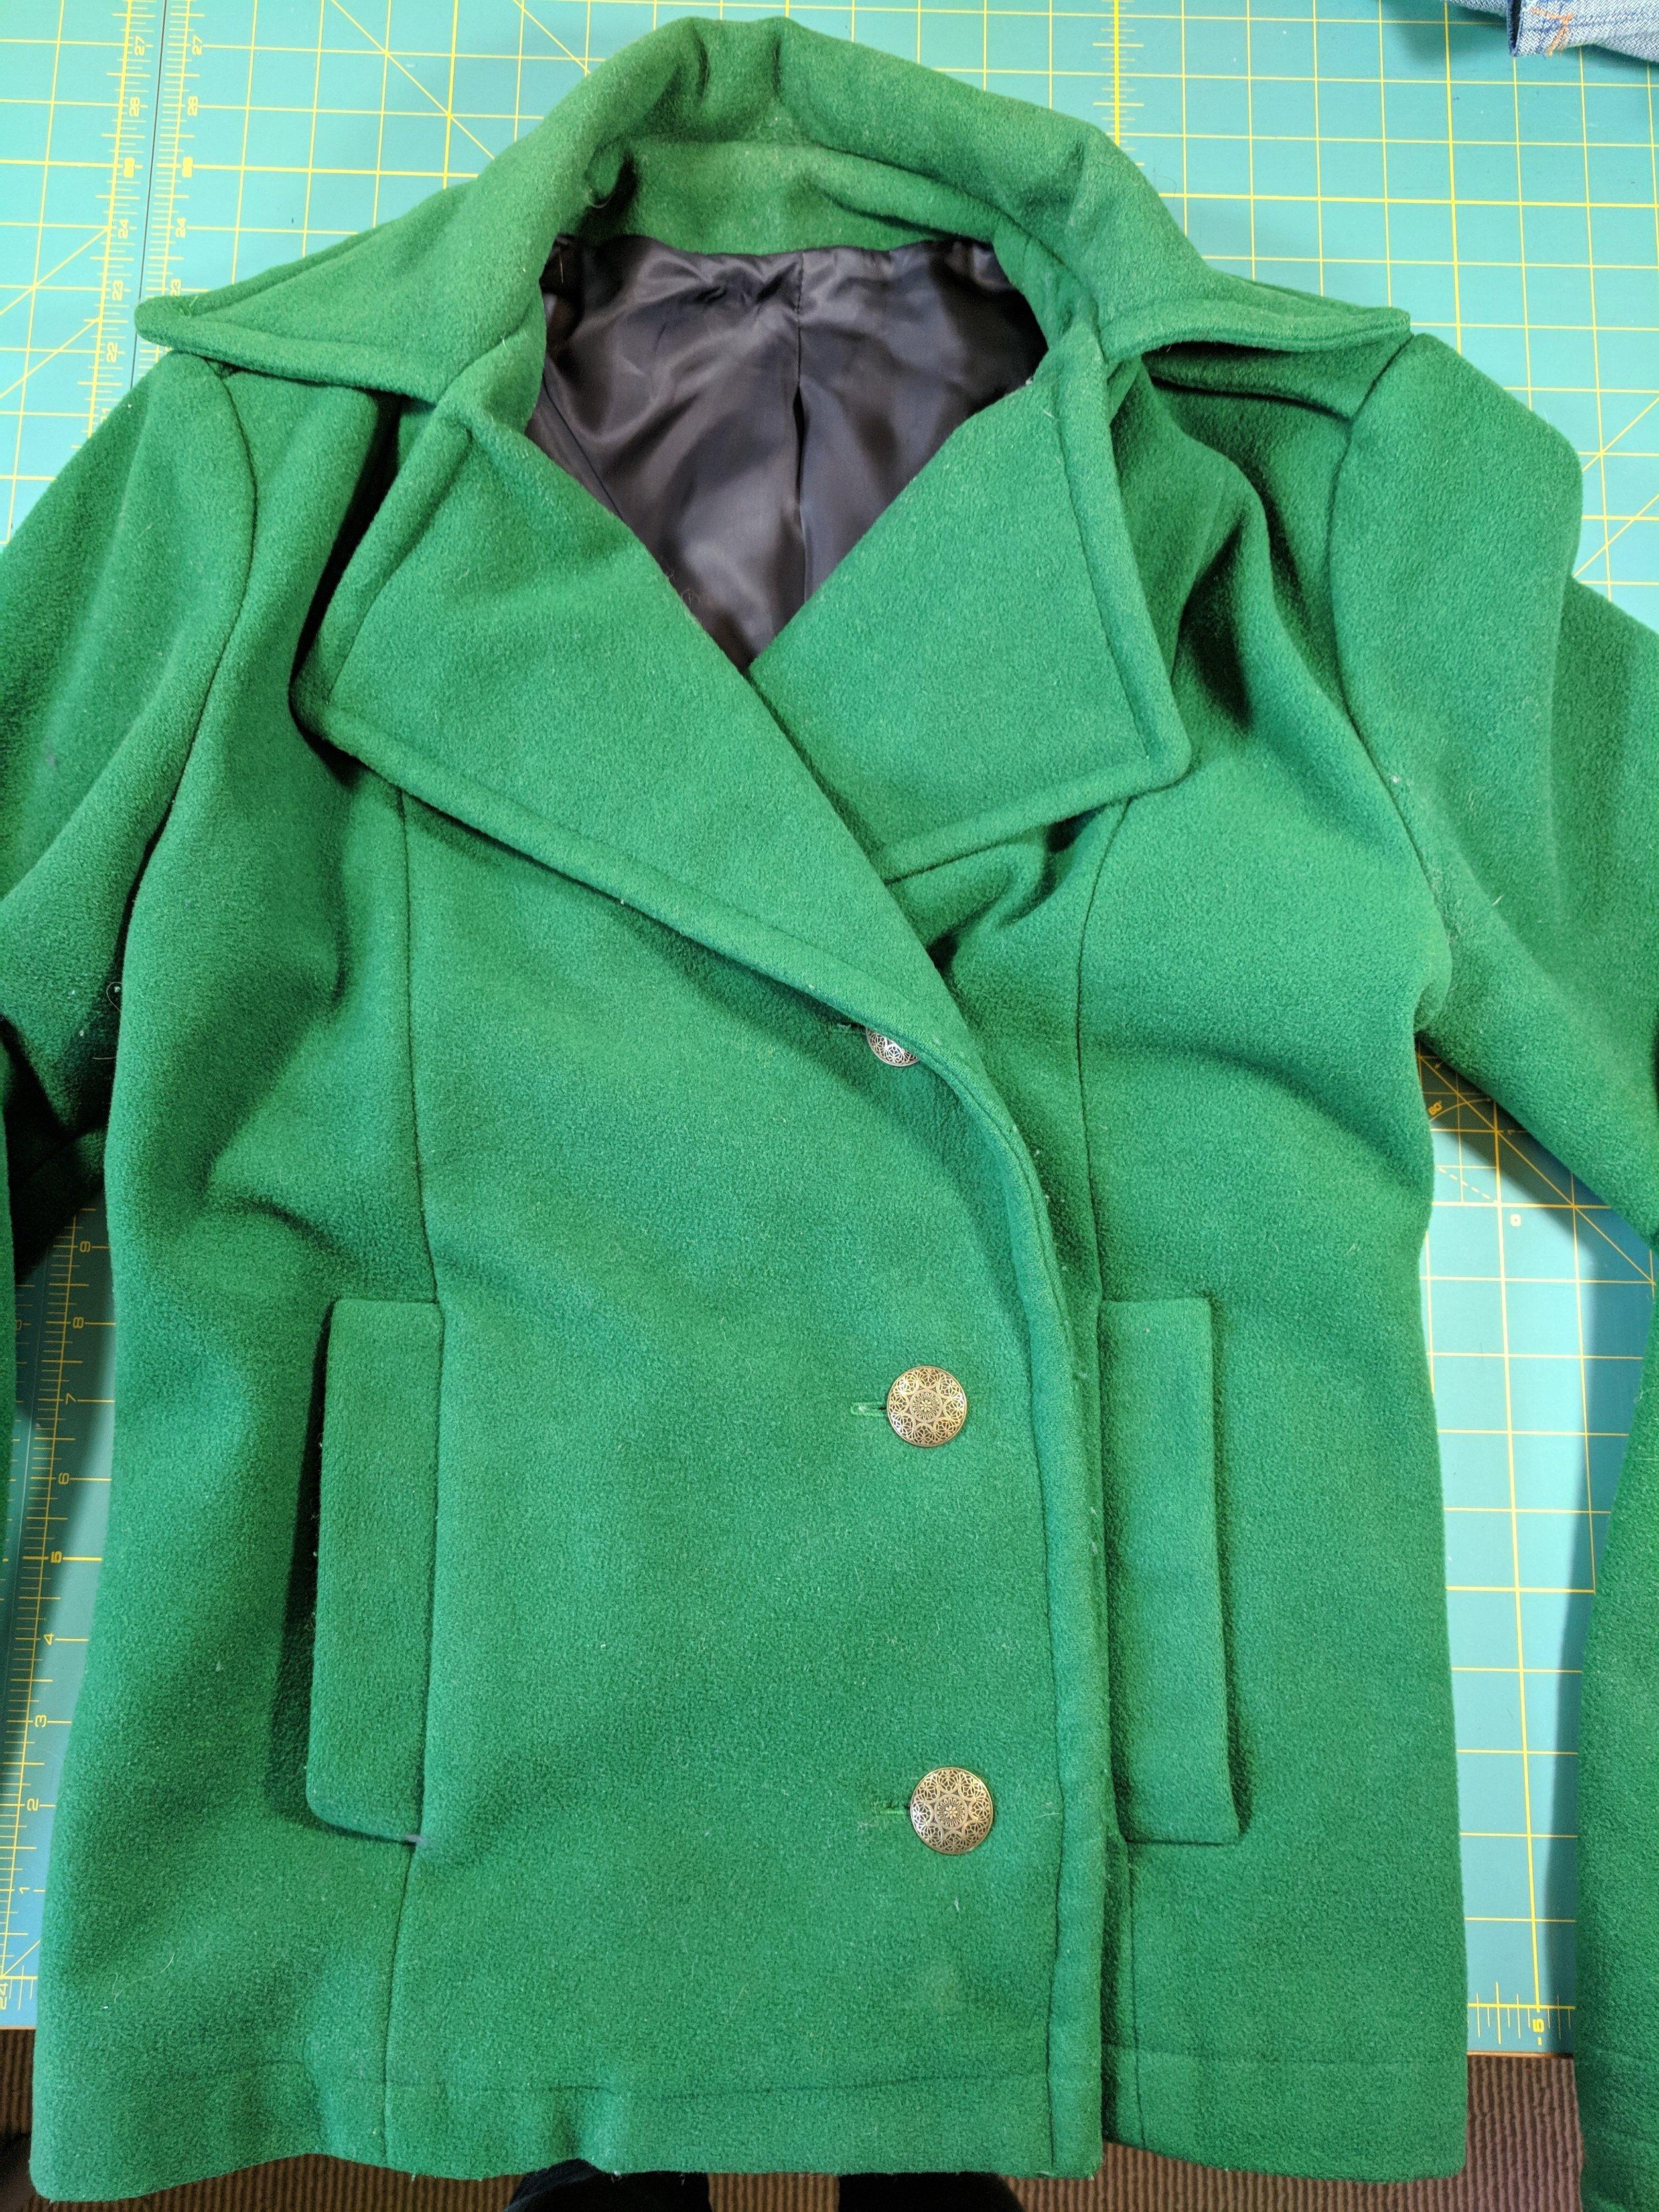 gee betty wool coat